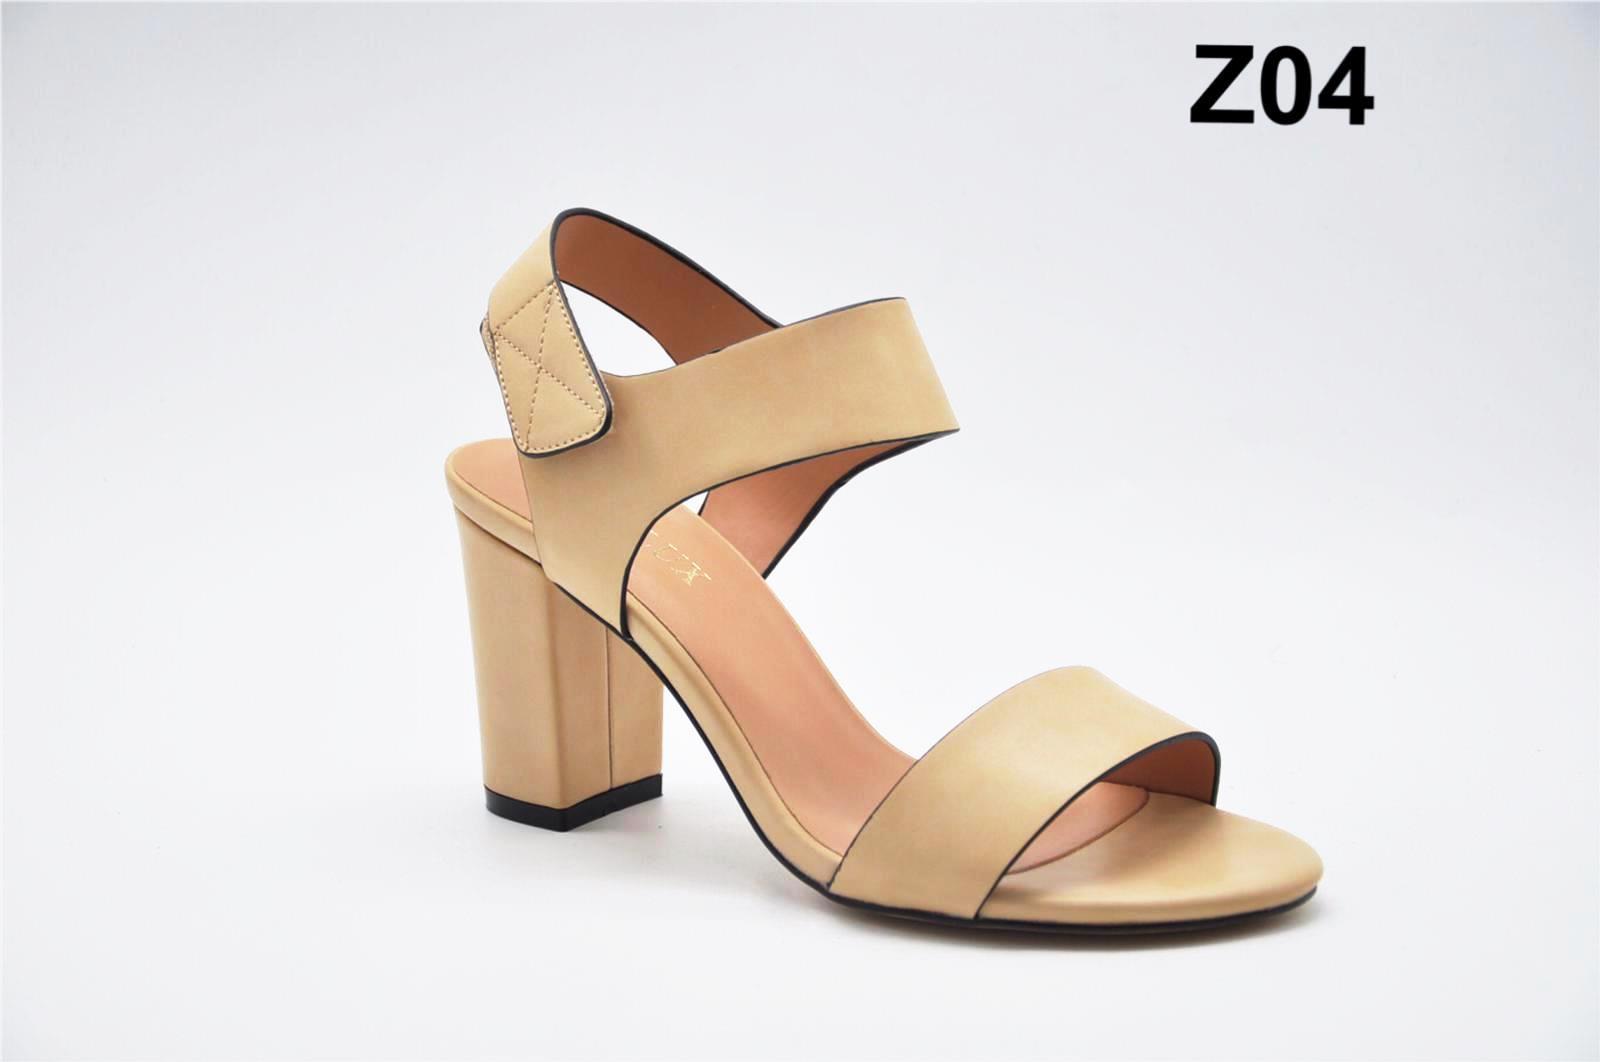 Sandale dama bej Nadine2